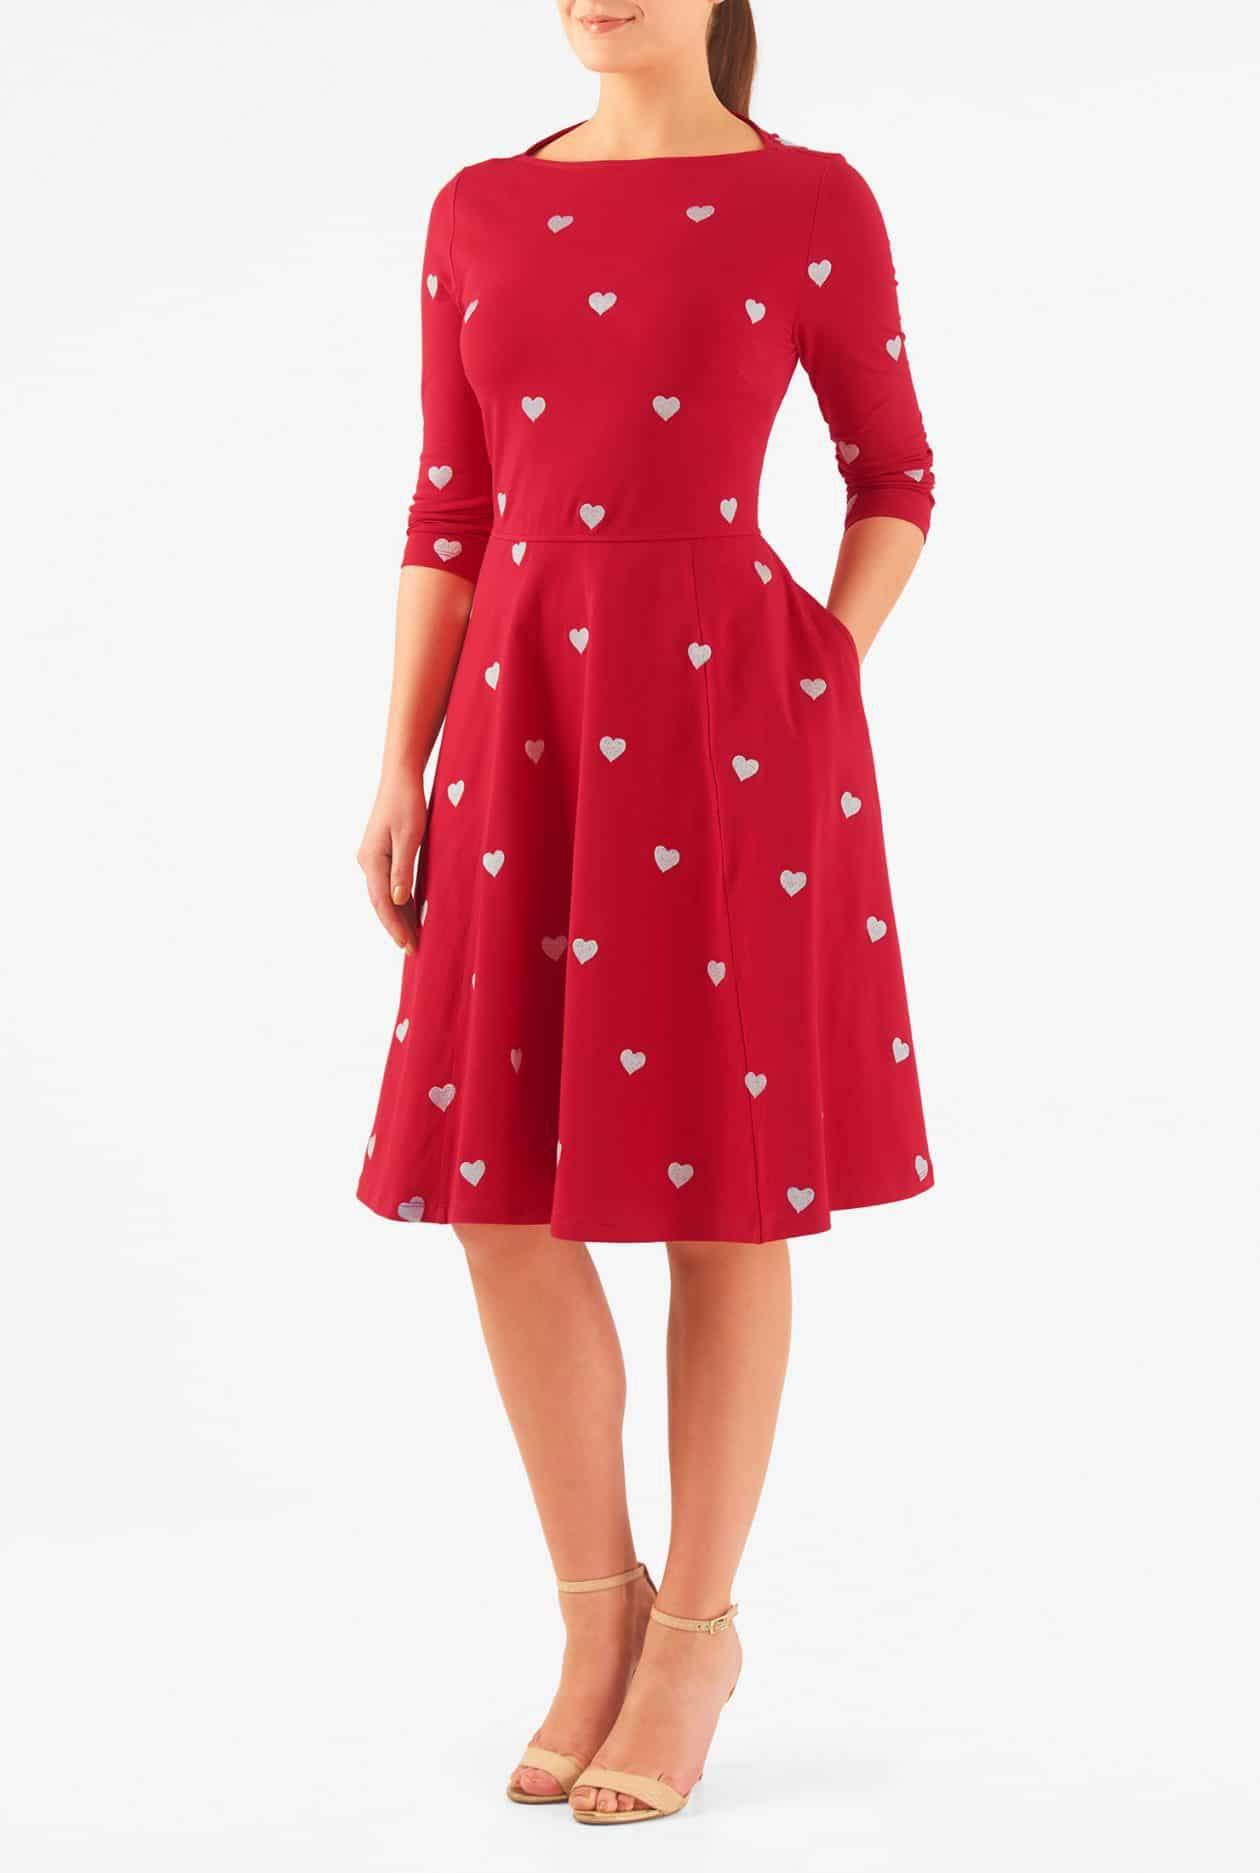 eShakti Heart Embellished Cotton Knit petite plus size Dress